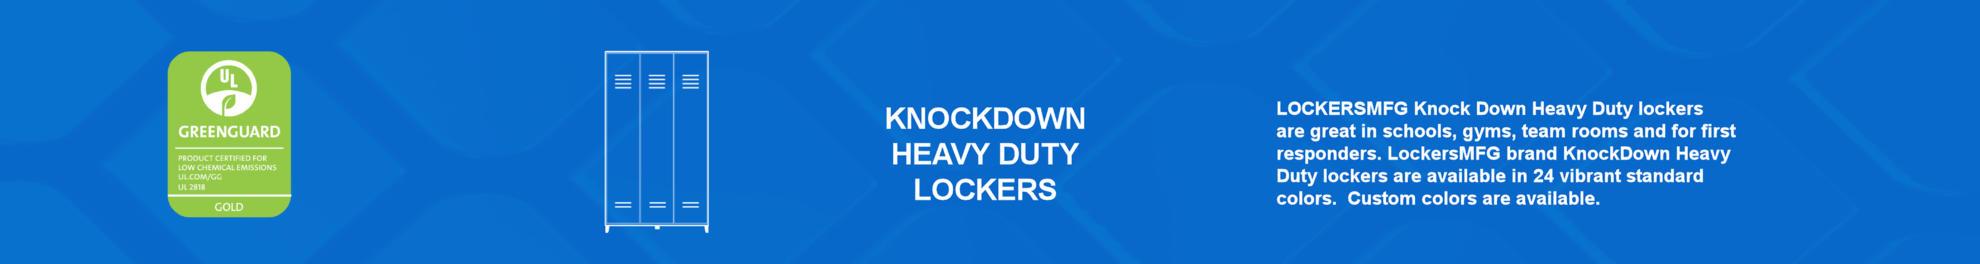 Knock Down HD DiamondBackground